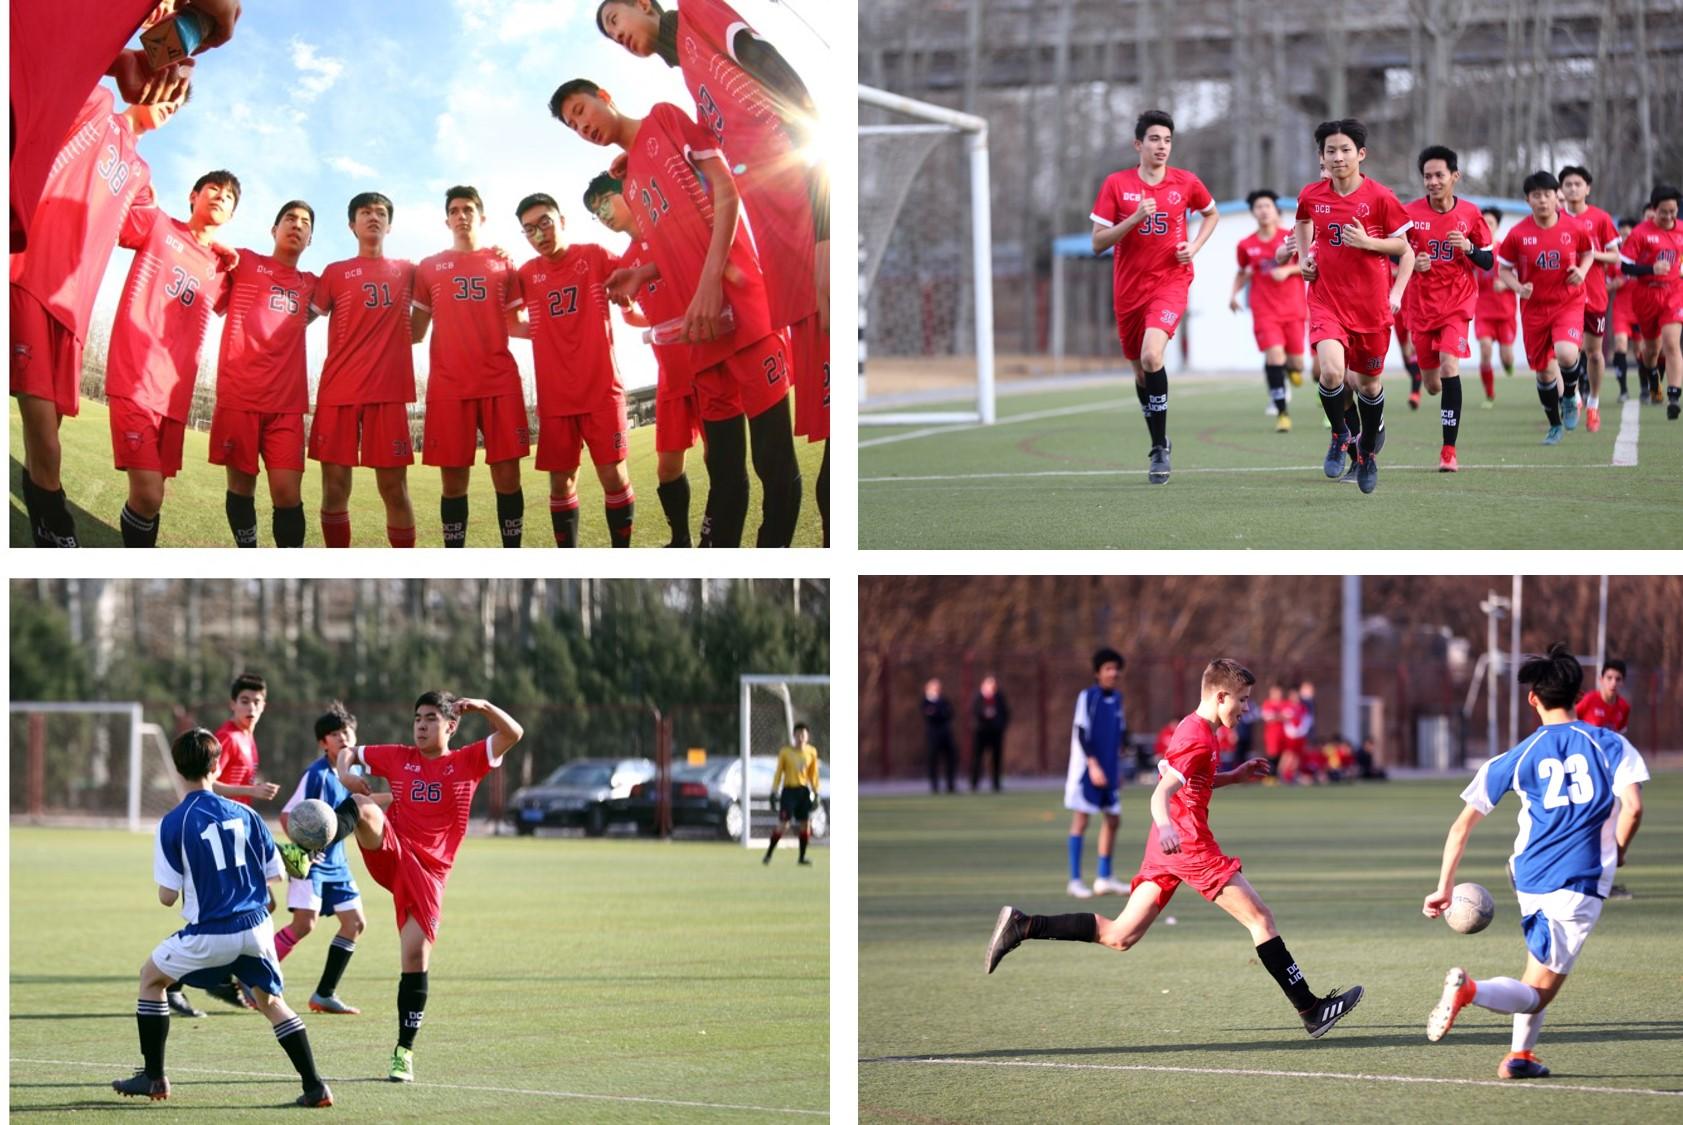 dcb-football-season-3-2019